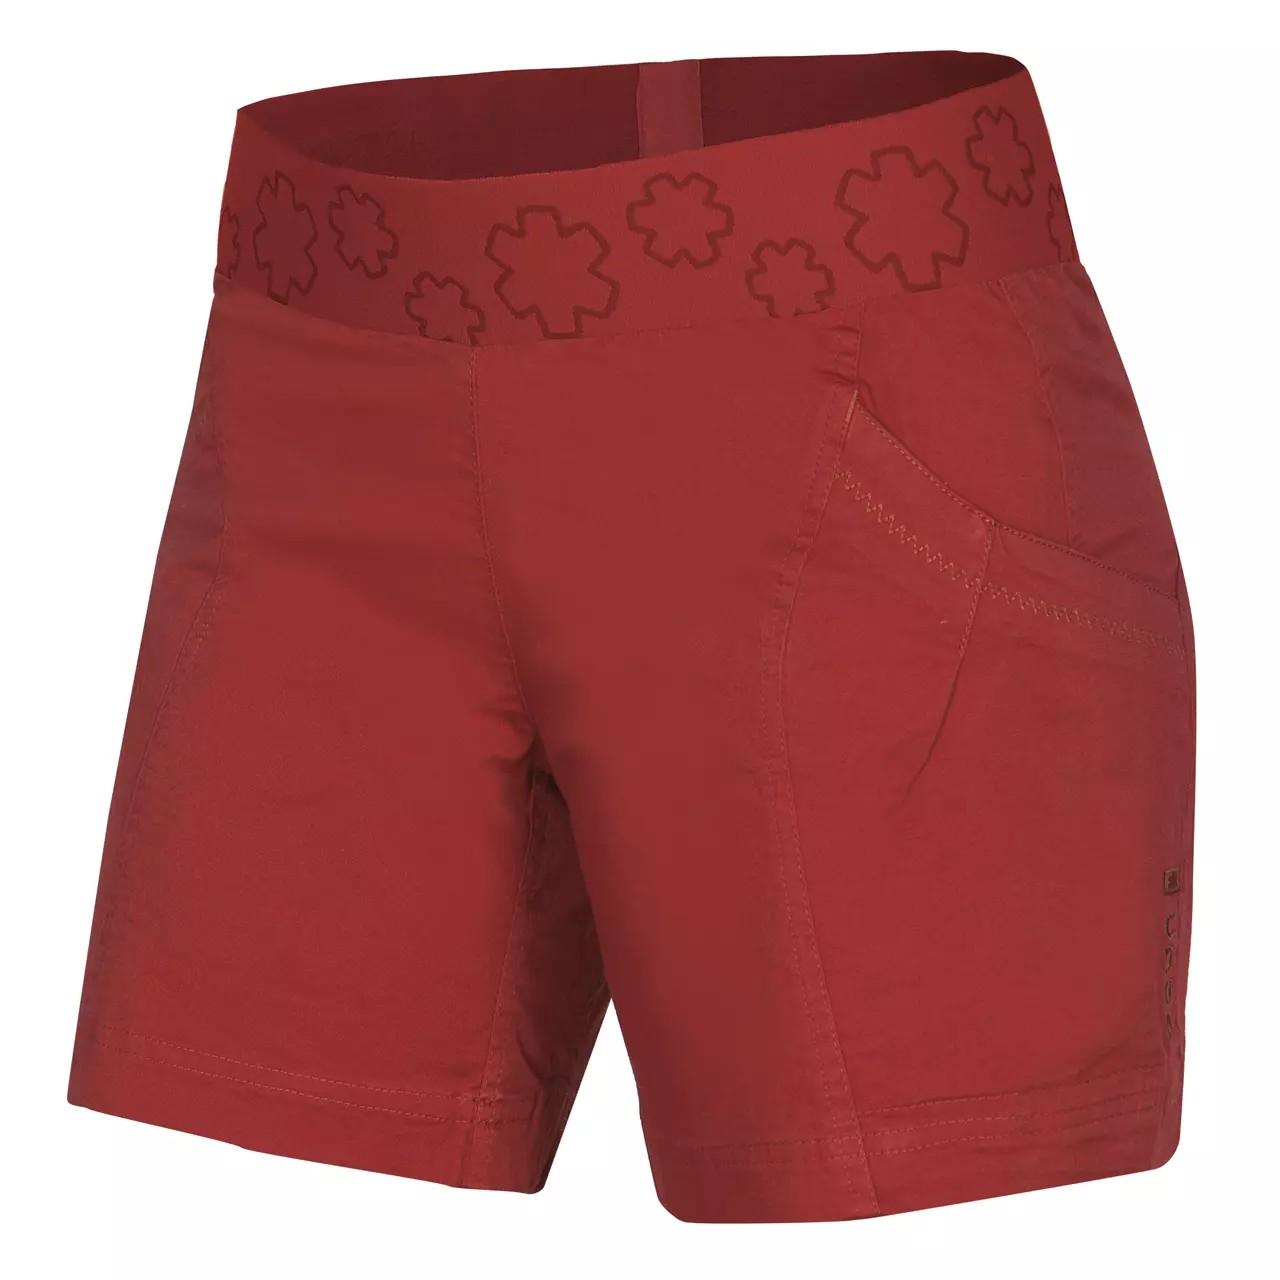 Pantera Shorts Women